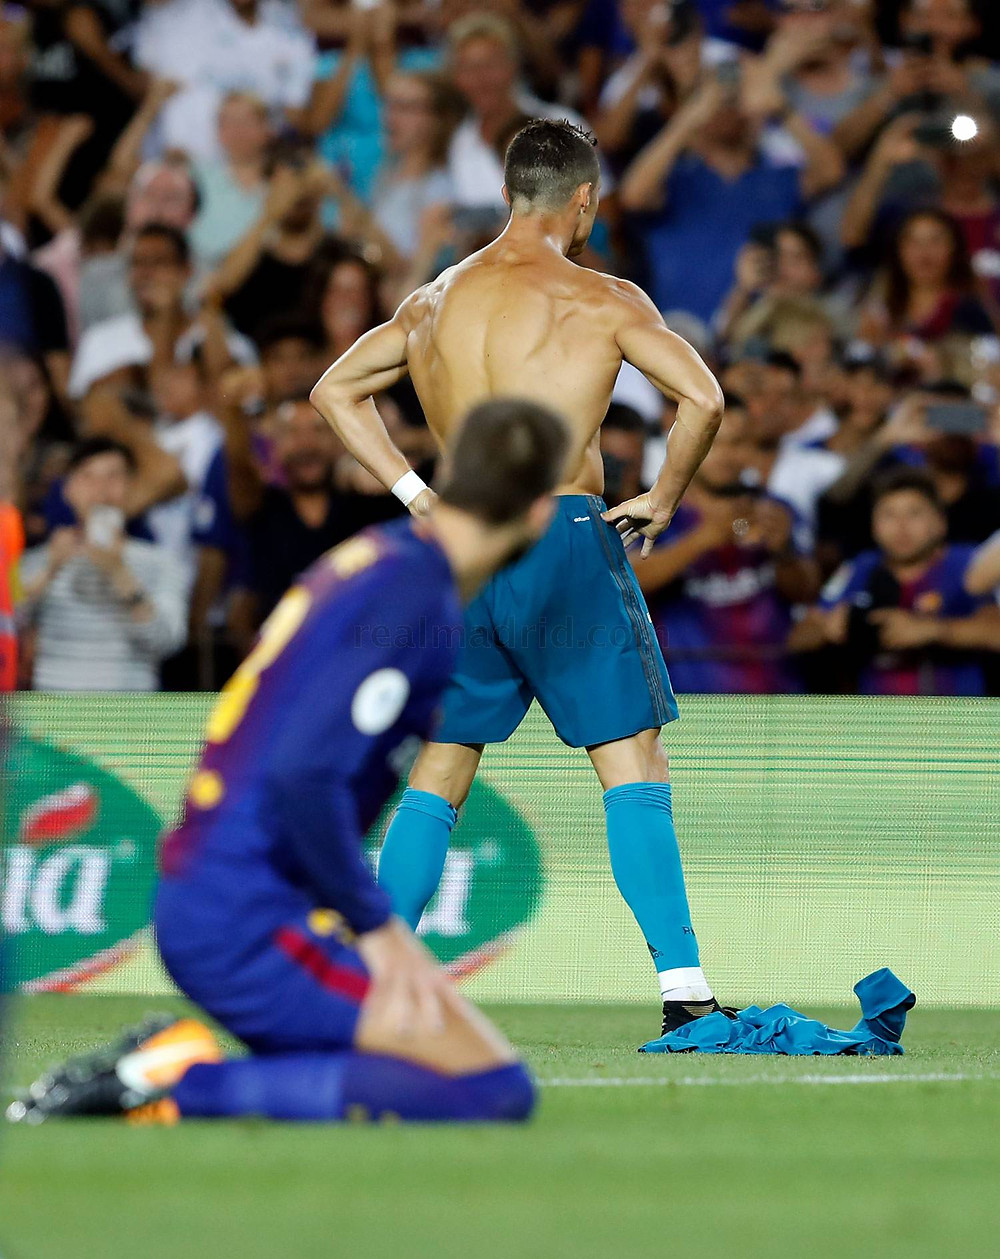 Cristiano Ronaldo comemora o gol contra o Barcelona